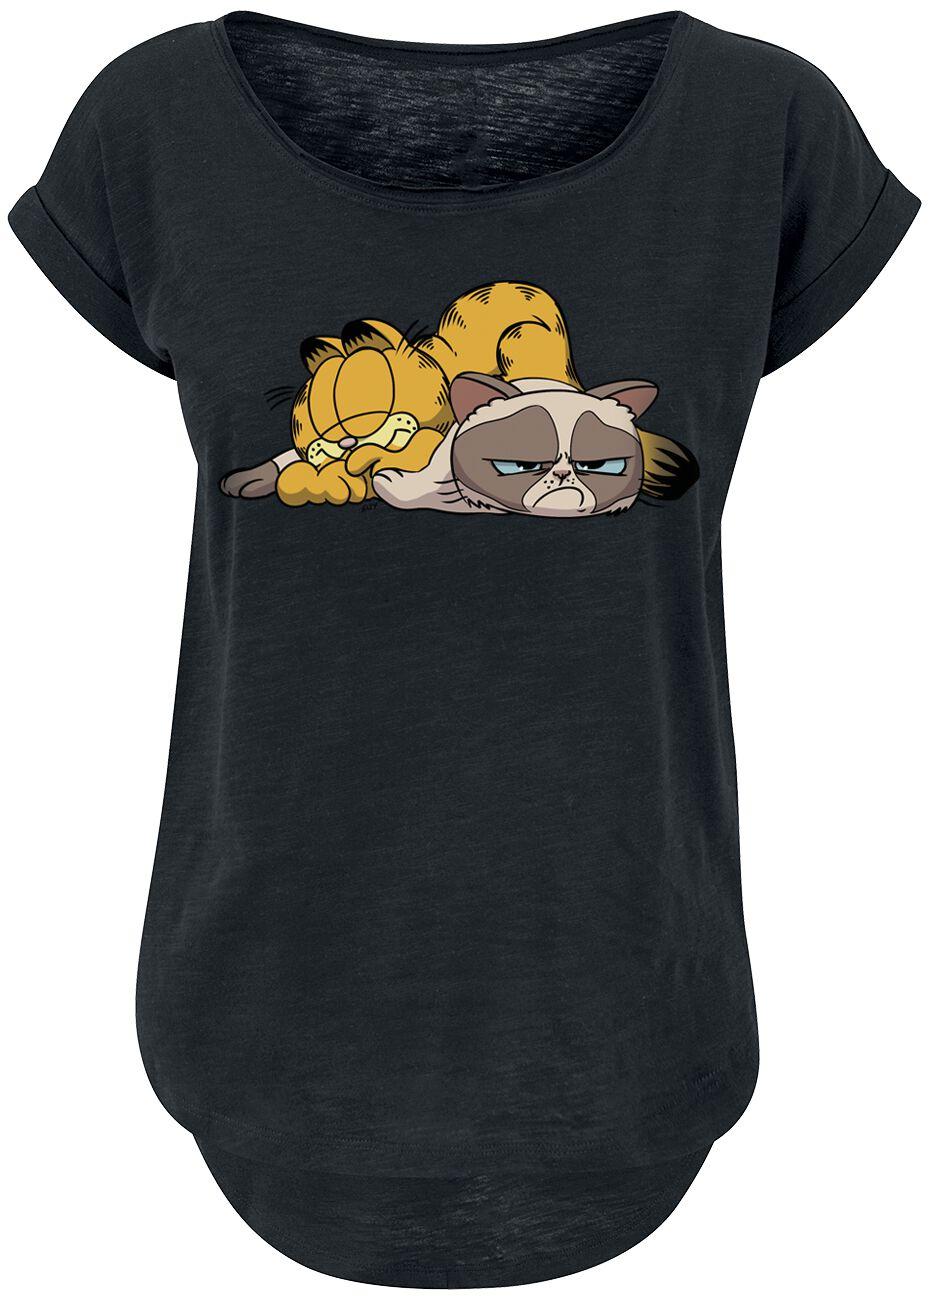 Grumpy Cat Double Trouble Koszulka damska czarny